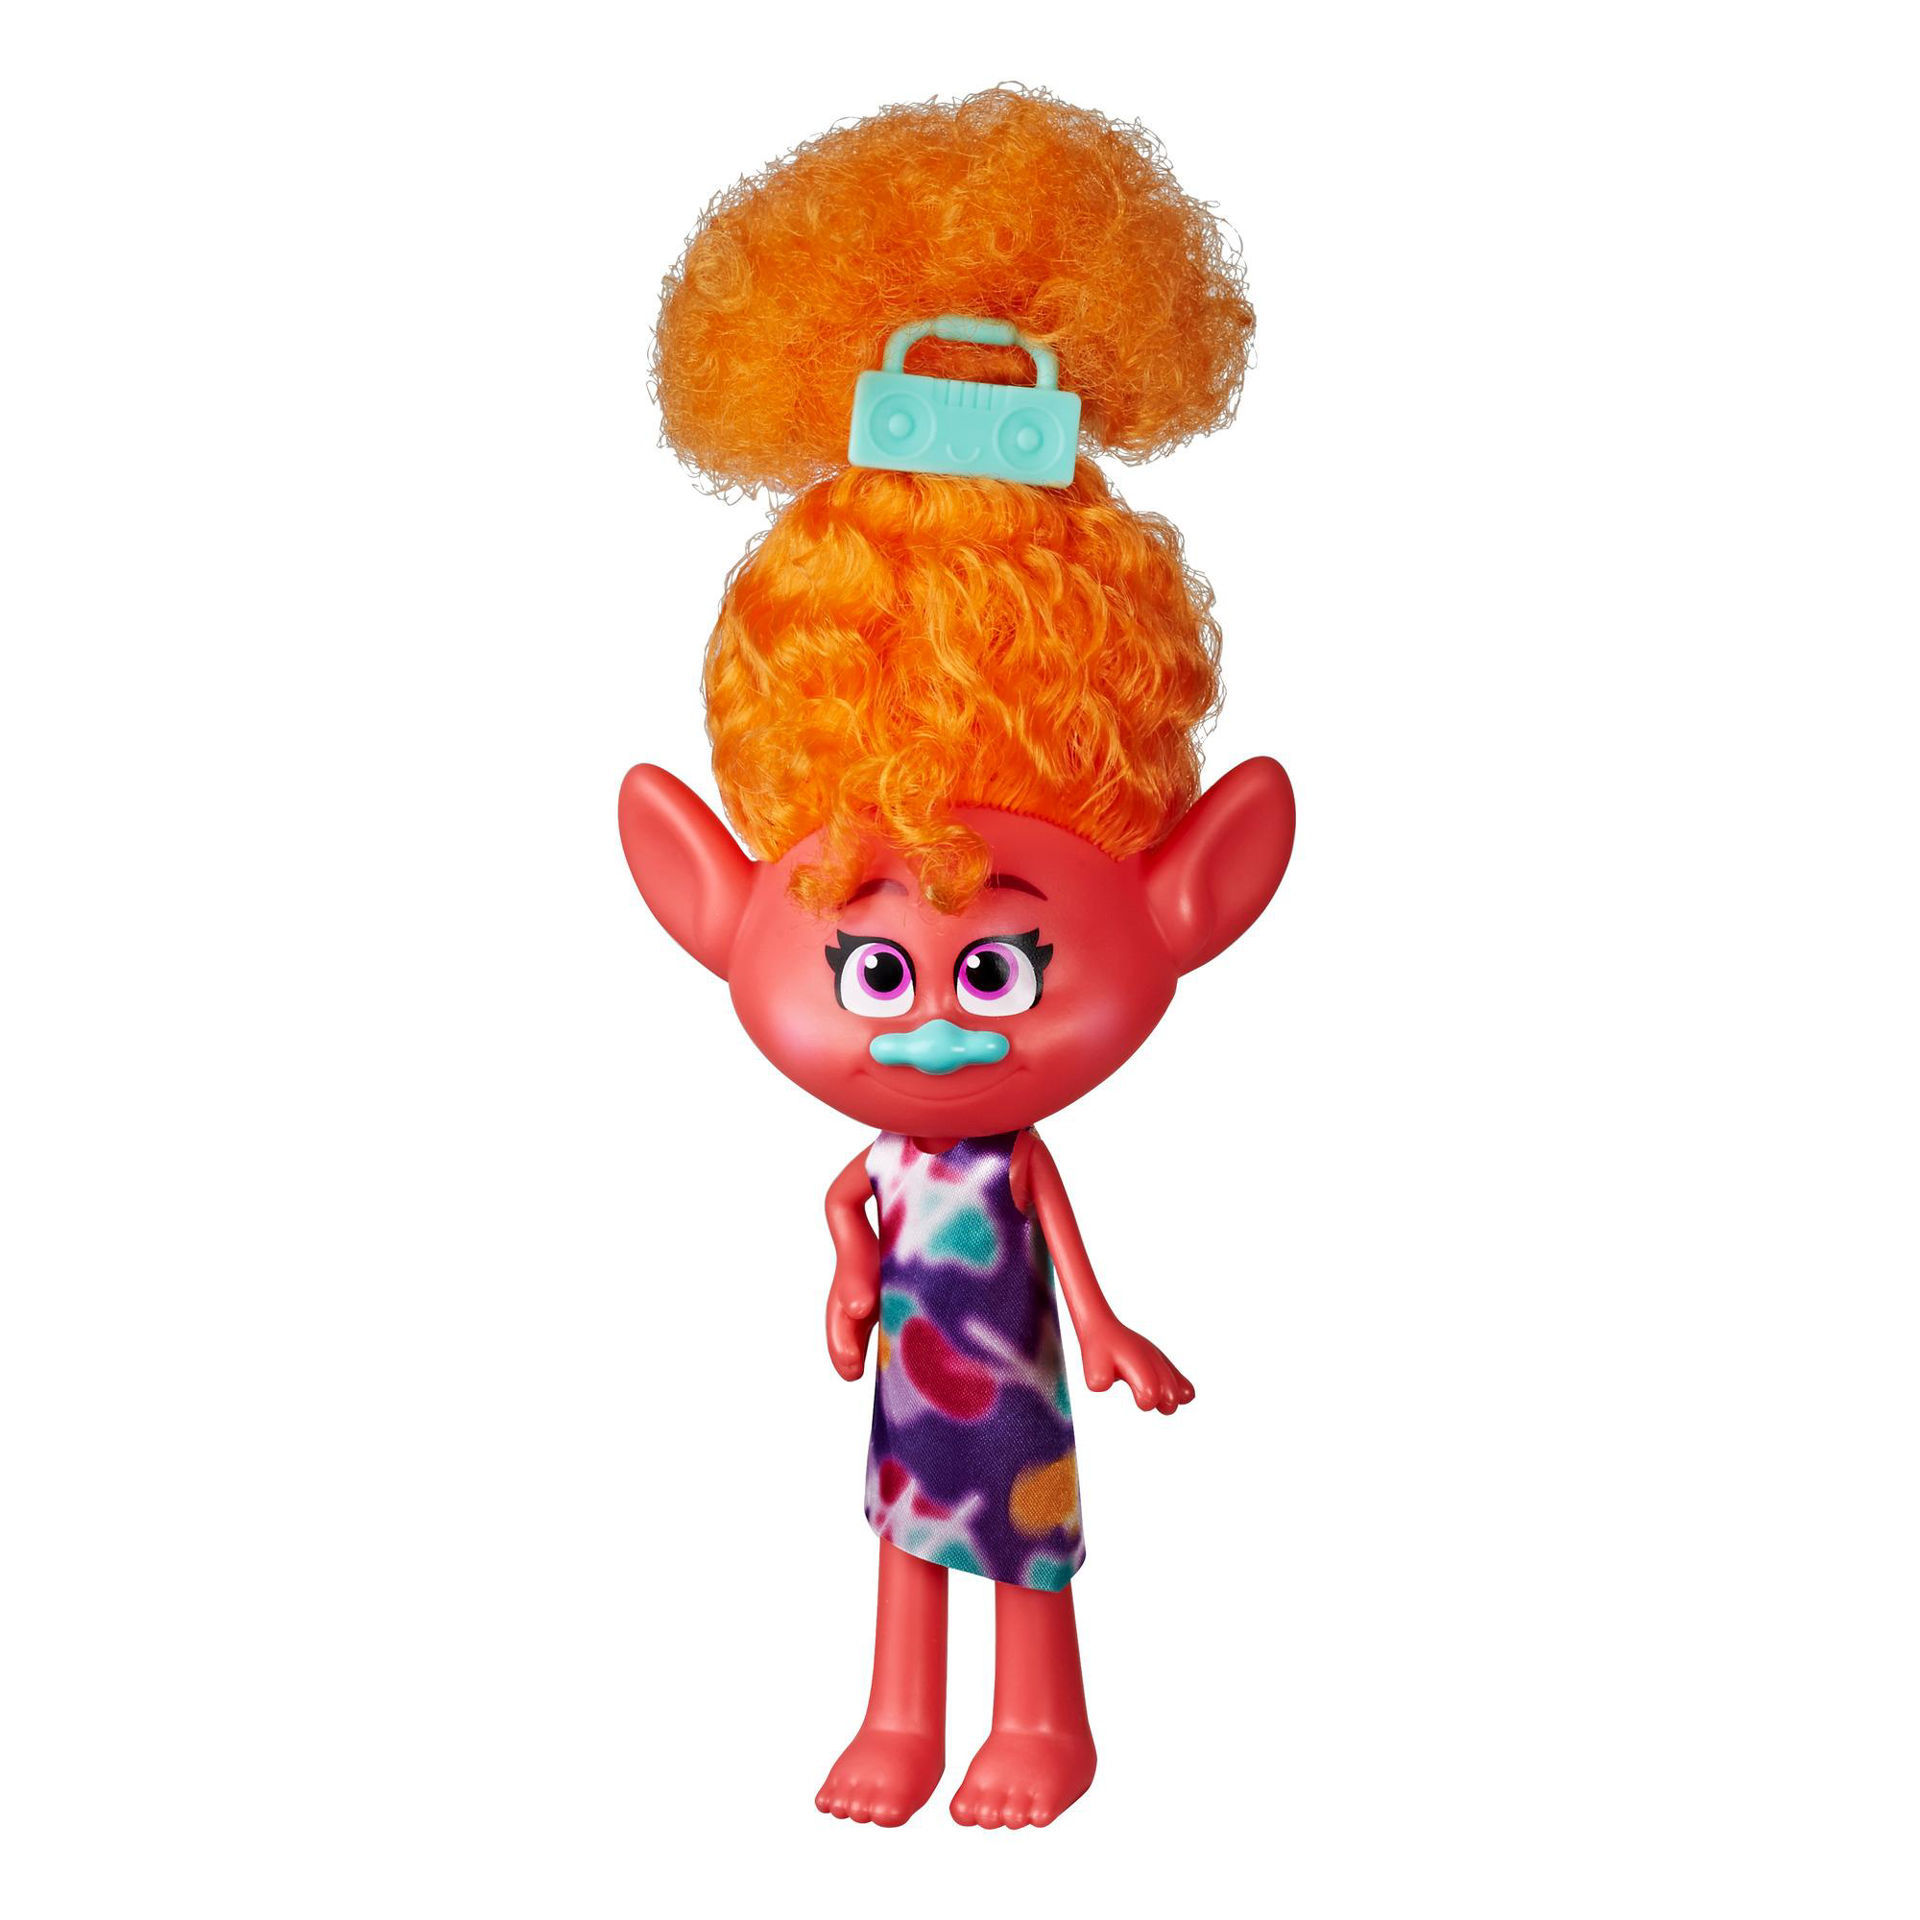 DreamWorks Trolls Stylin' DJ Suki Fashion Doll